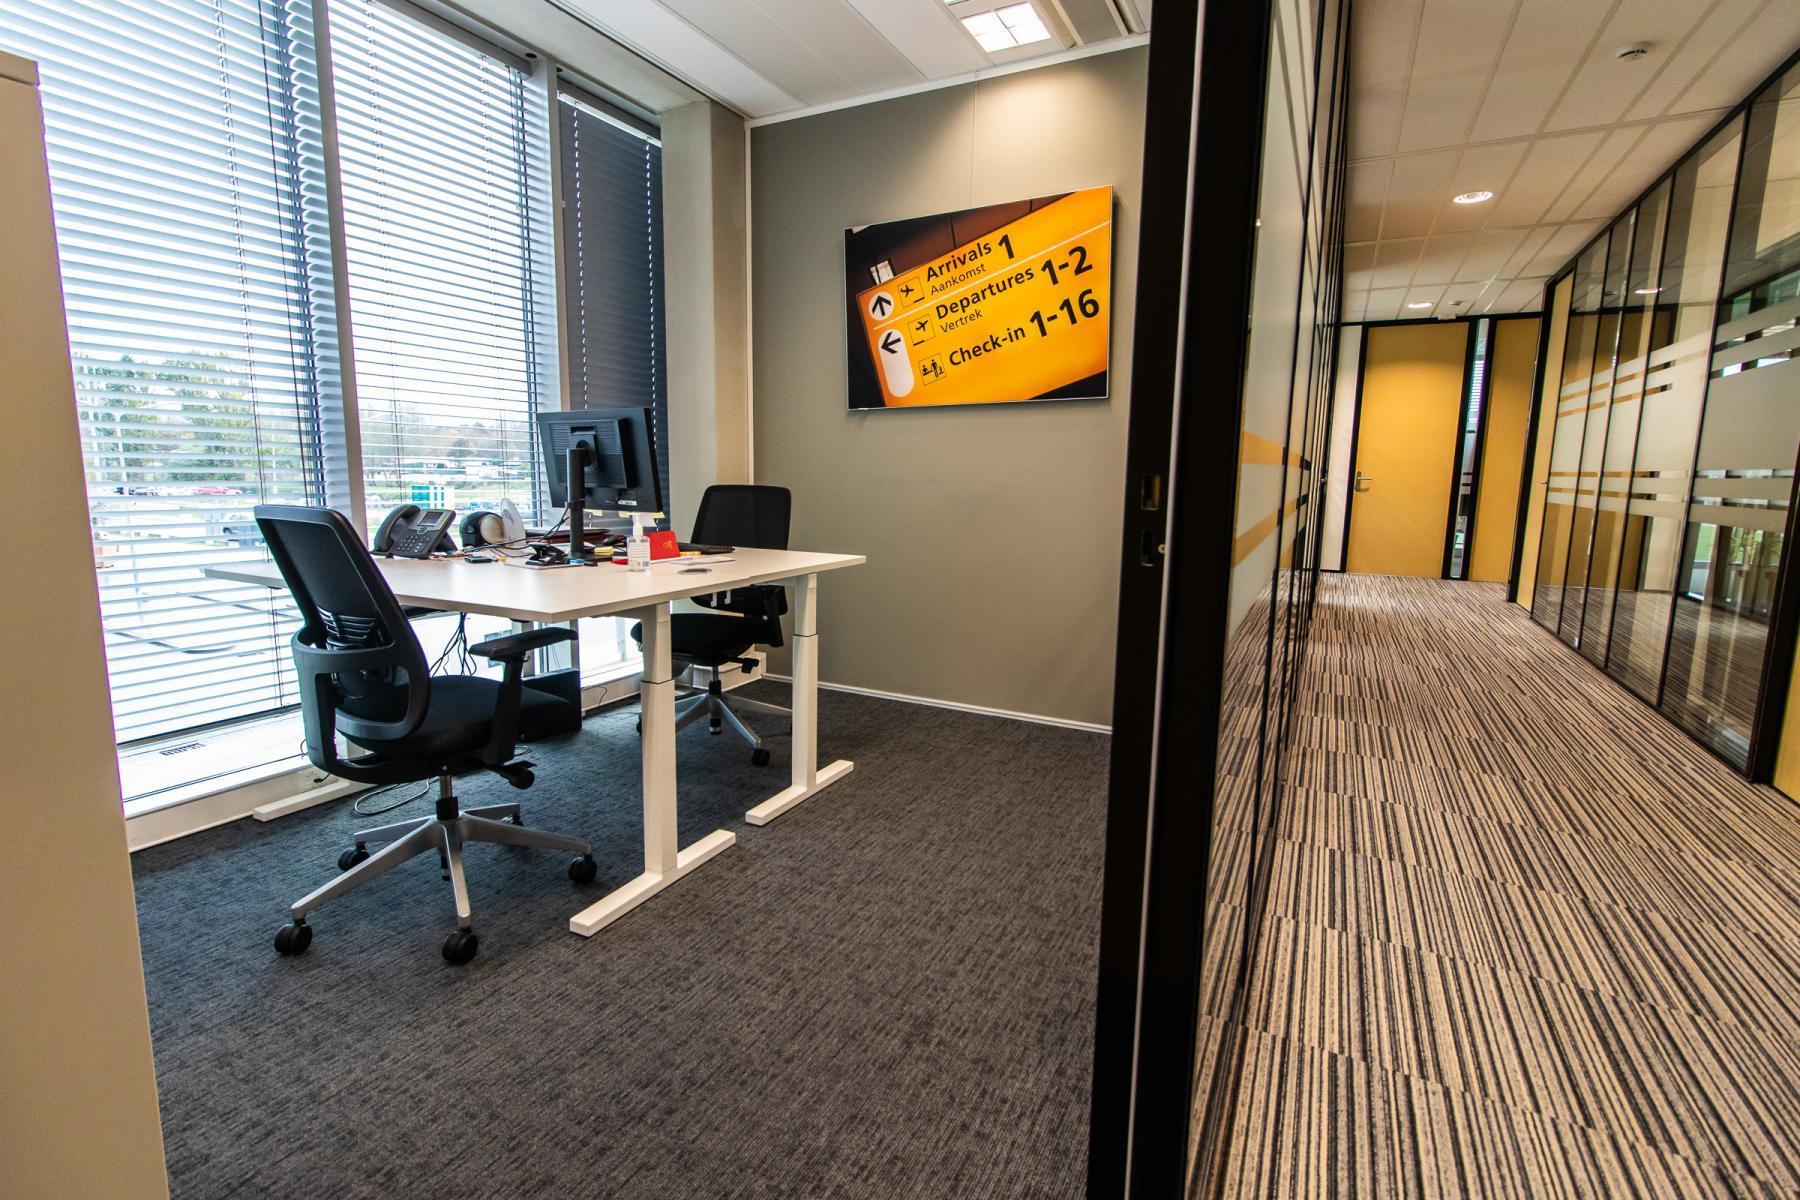 Rent office space Rotterdam Airportplein 22, Rotterdam (25)